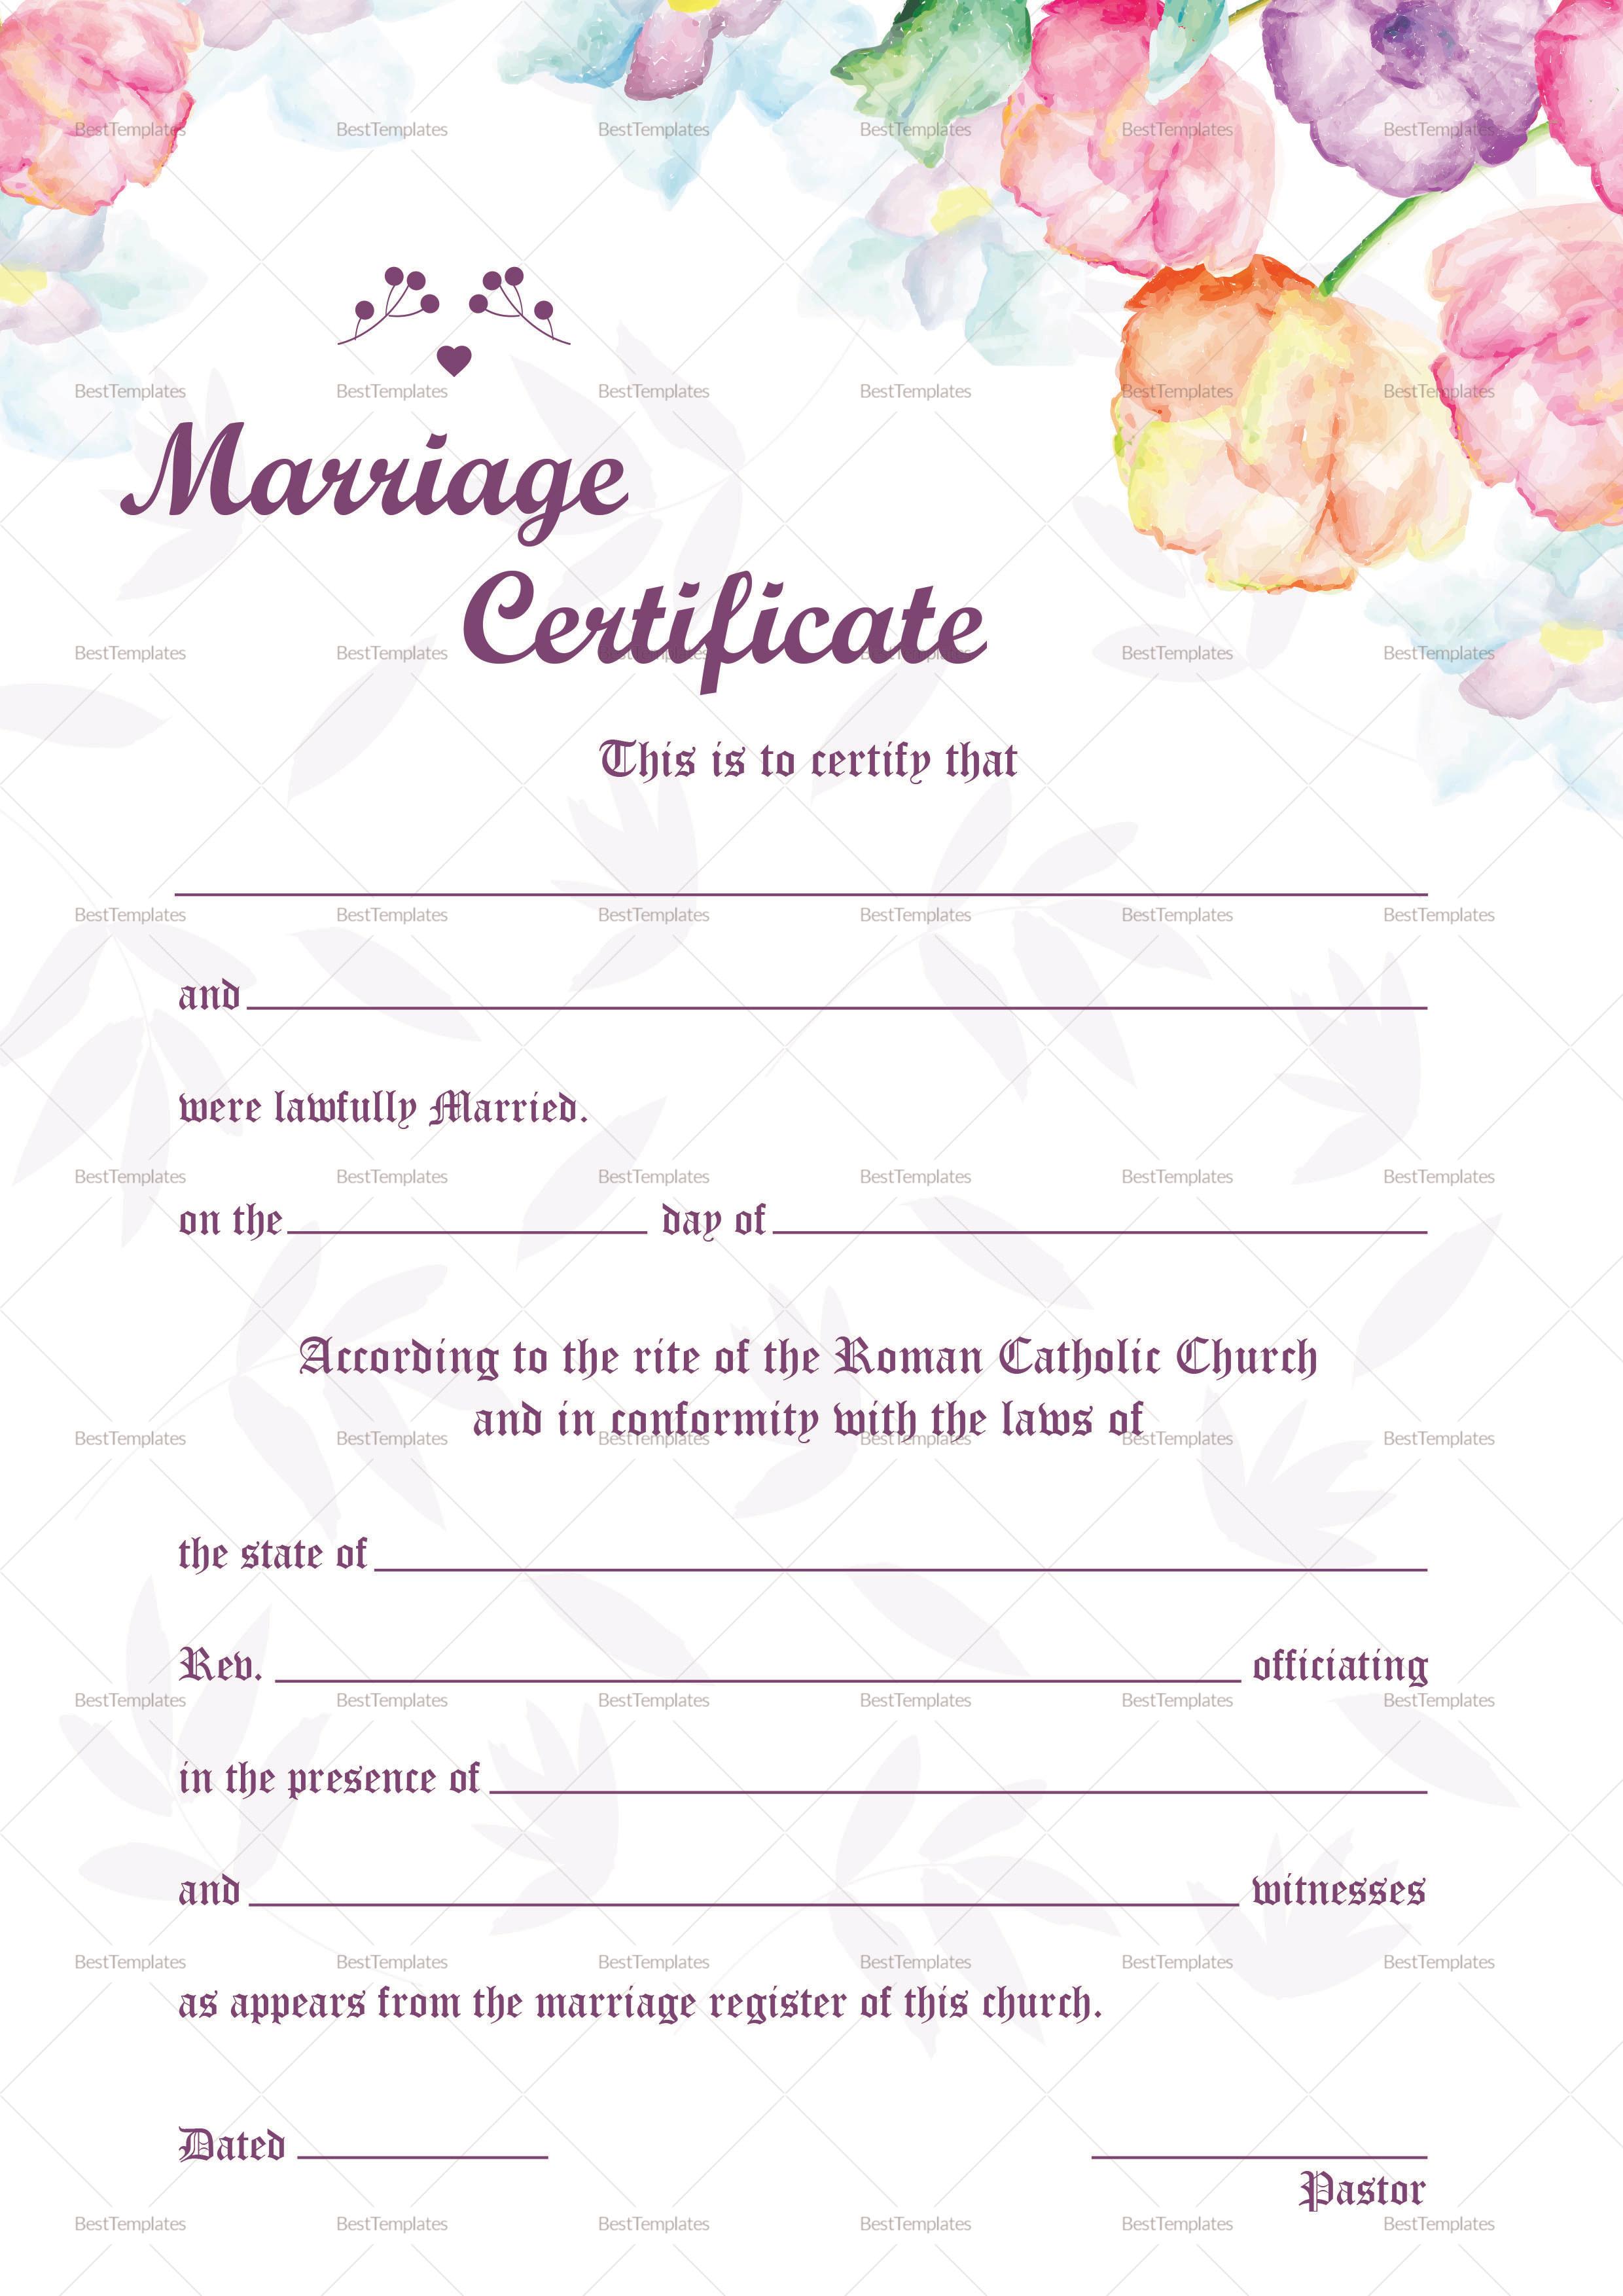 wedding certificate template wedding certificate png